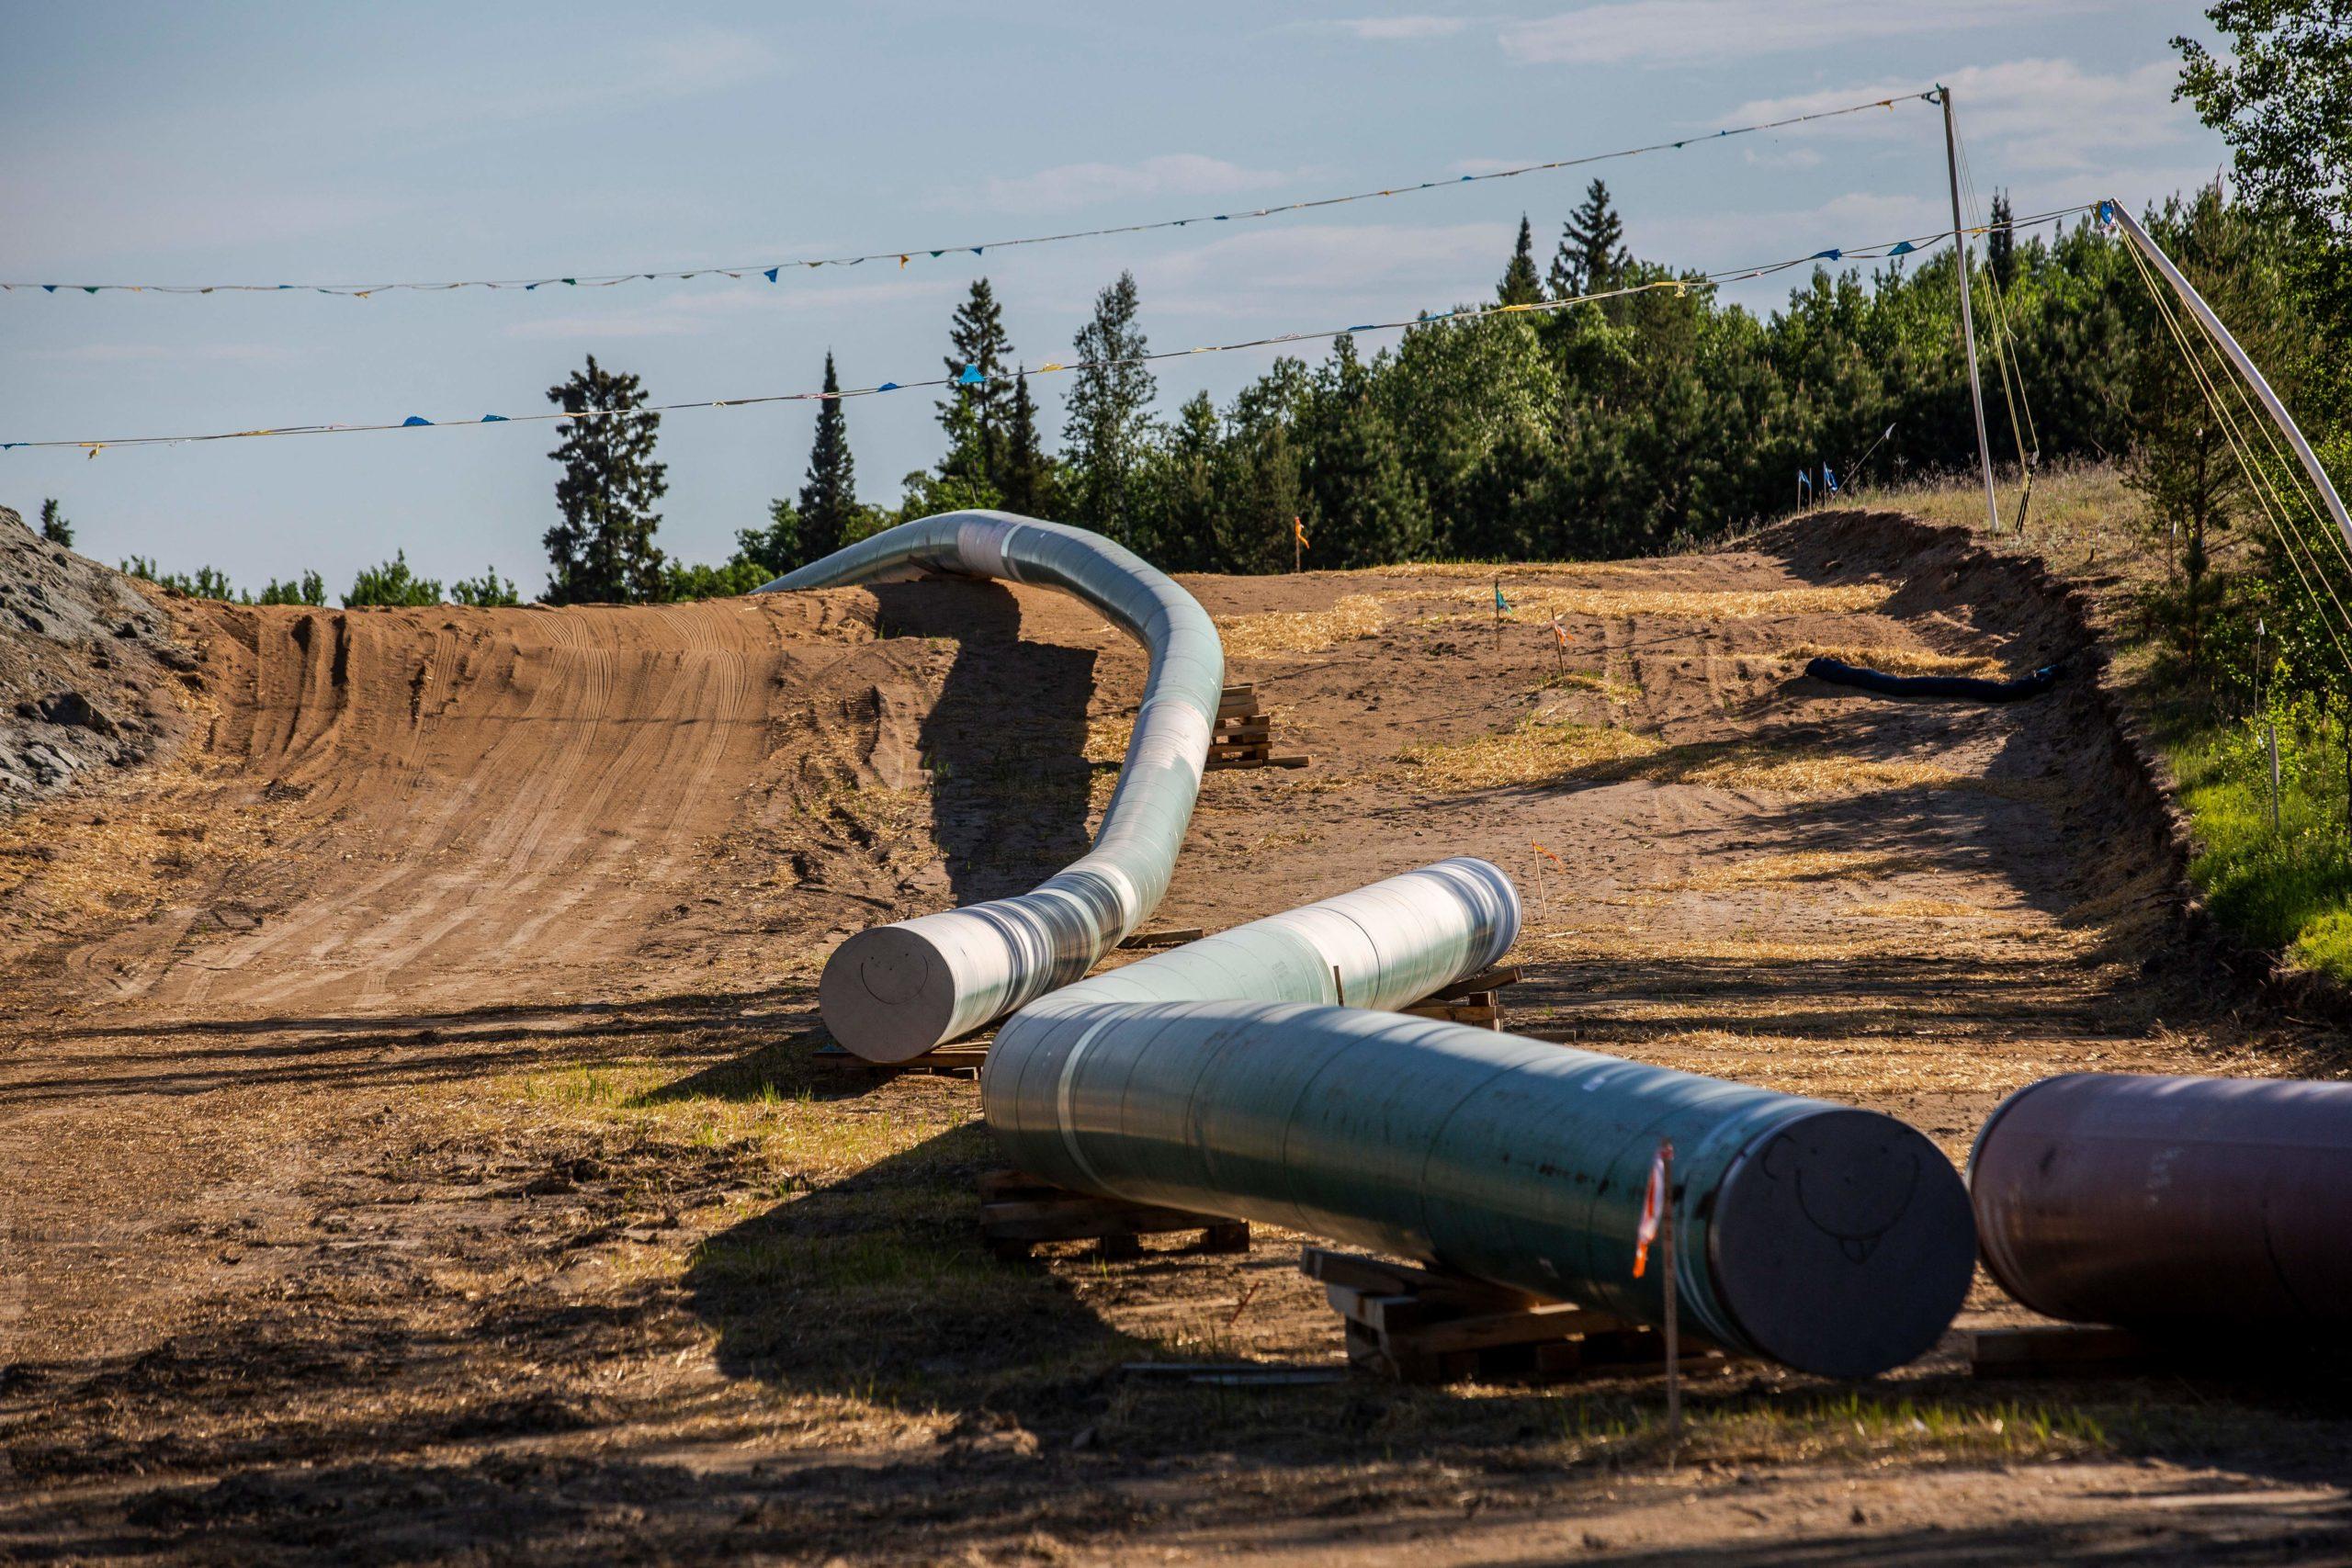 A pipeline that will flow through North Dakota and Minnesota is seen near Wauburn, Minnesota on June 5, 2021. (Kerem Yucel/AFP via Getty Images)